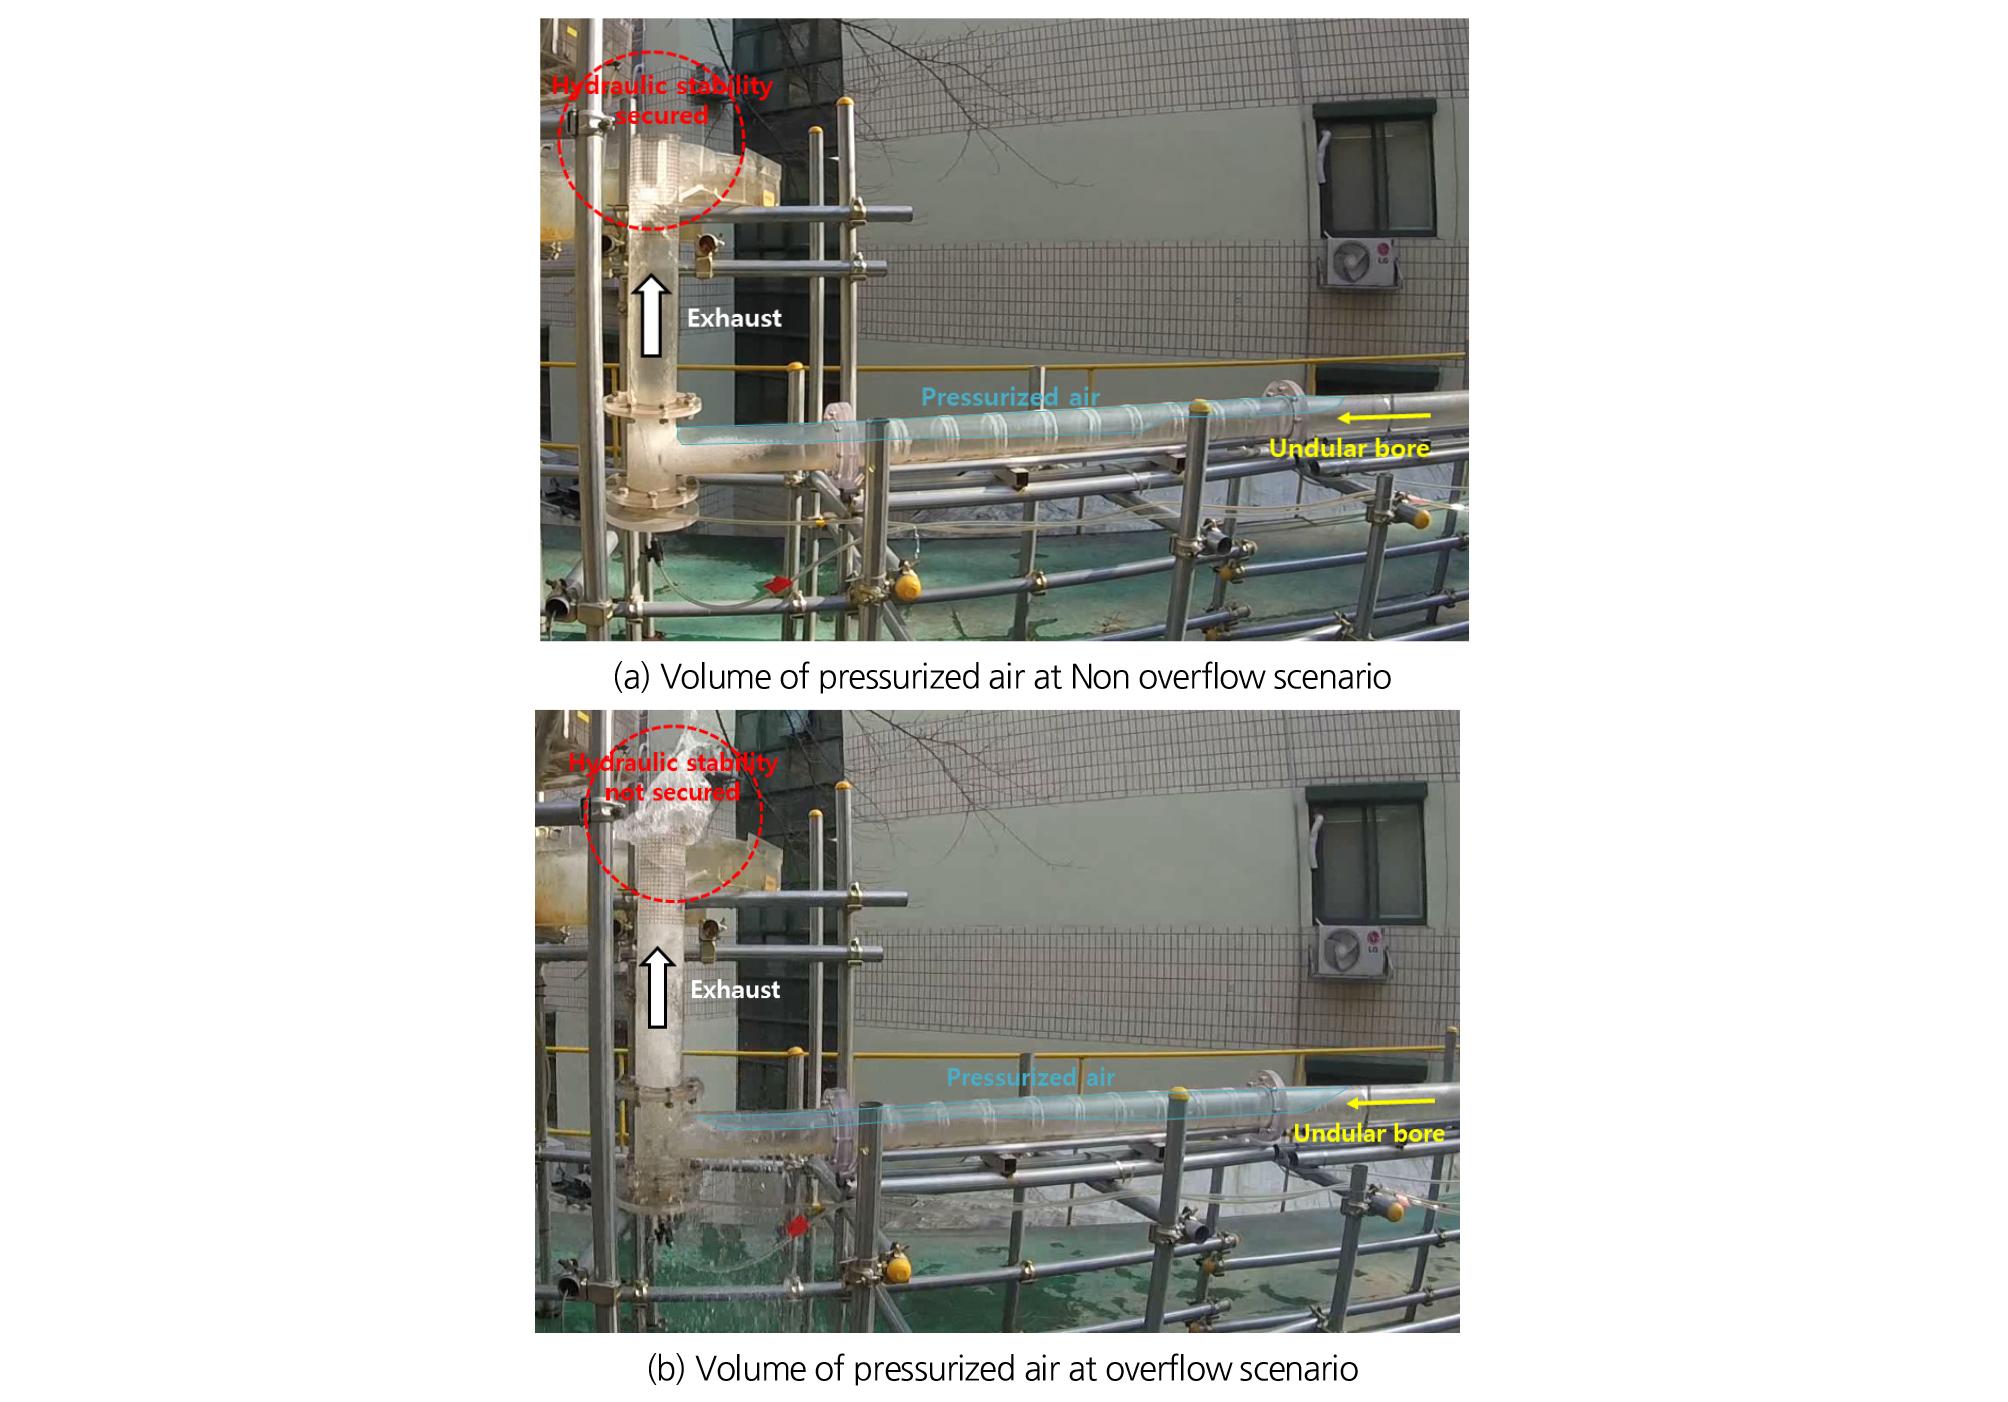 http://static.apub.kr/journalsite/sites/kwra/2020-053-04/N0200530407/images/kwra_53_04_07_F9.jpg